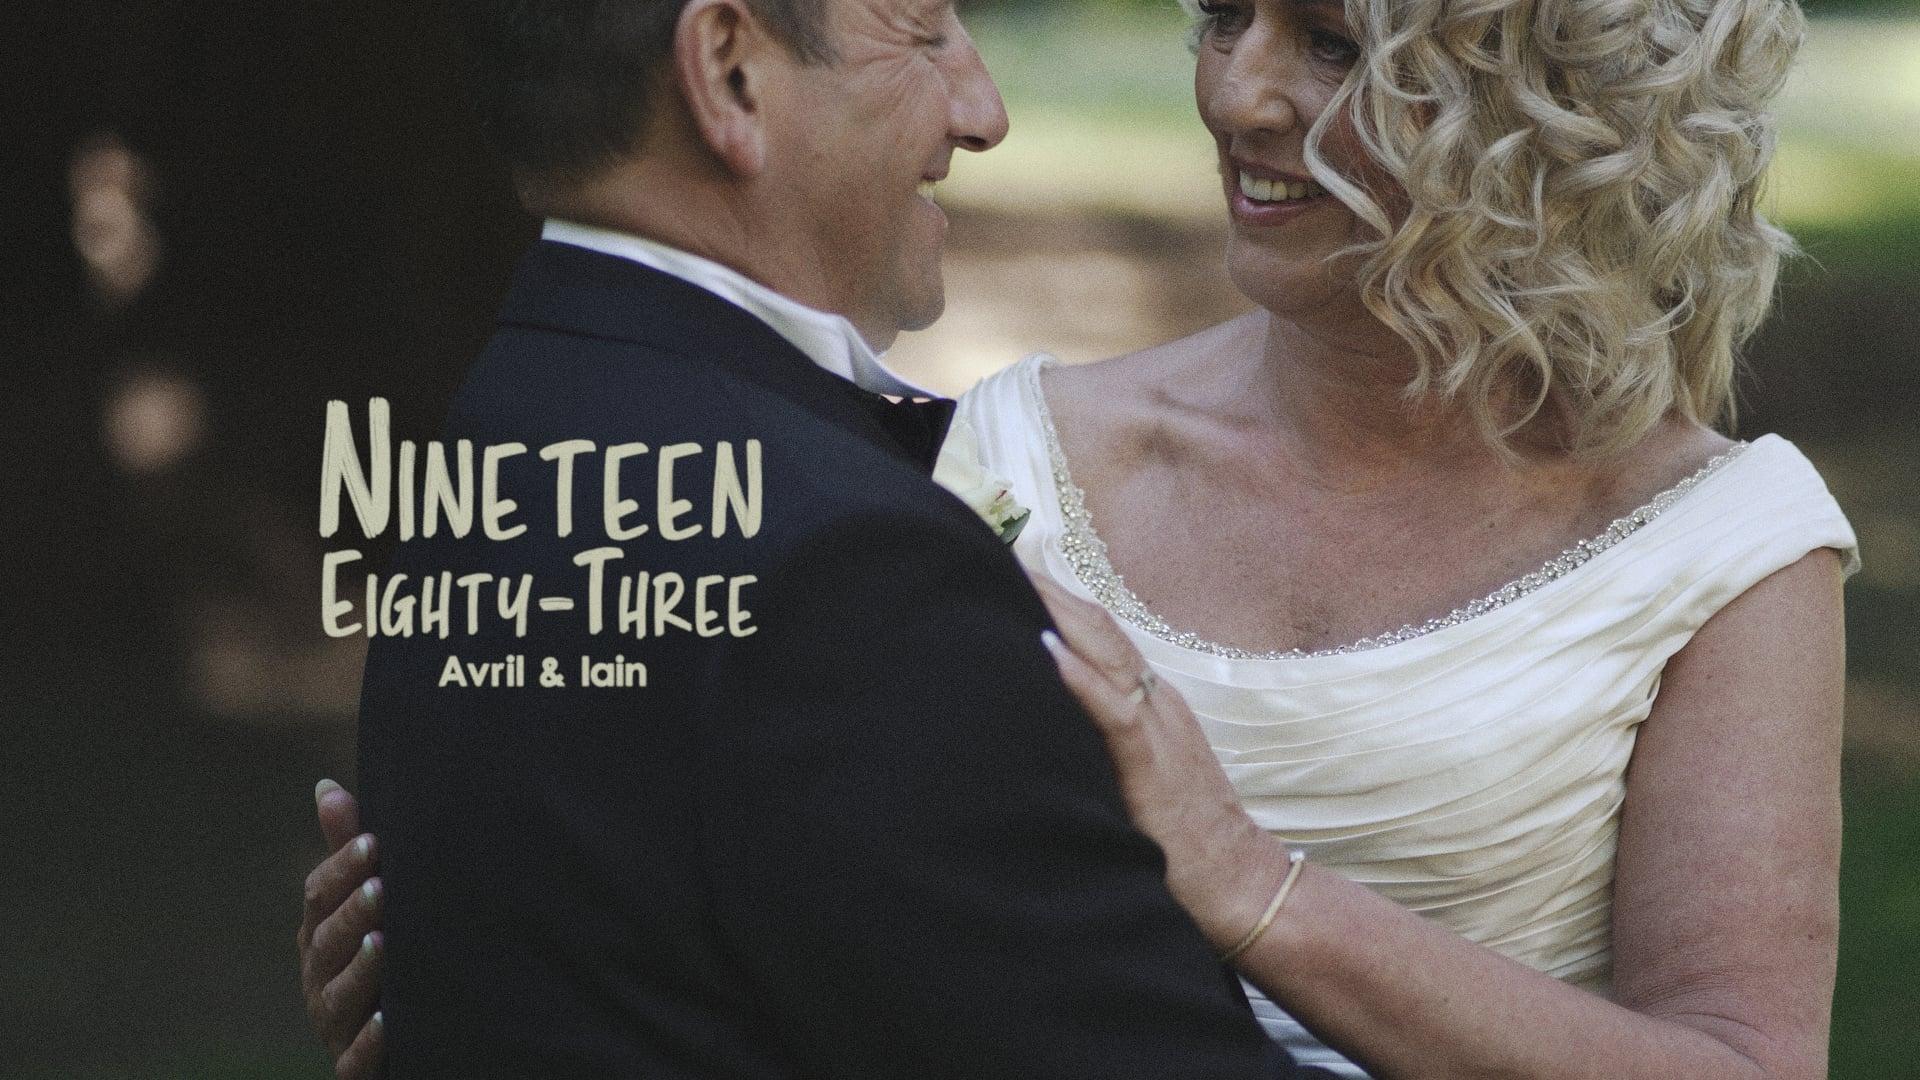 Nineteen Eighty-Three by Avril and Iain